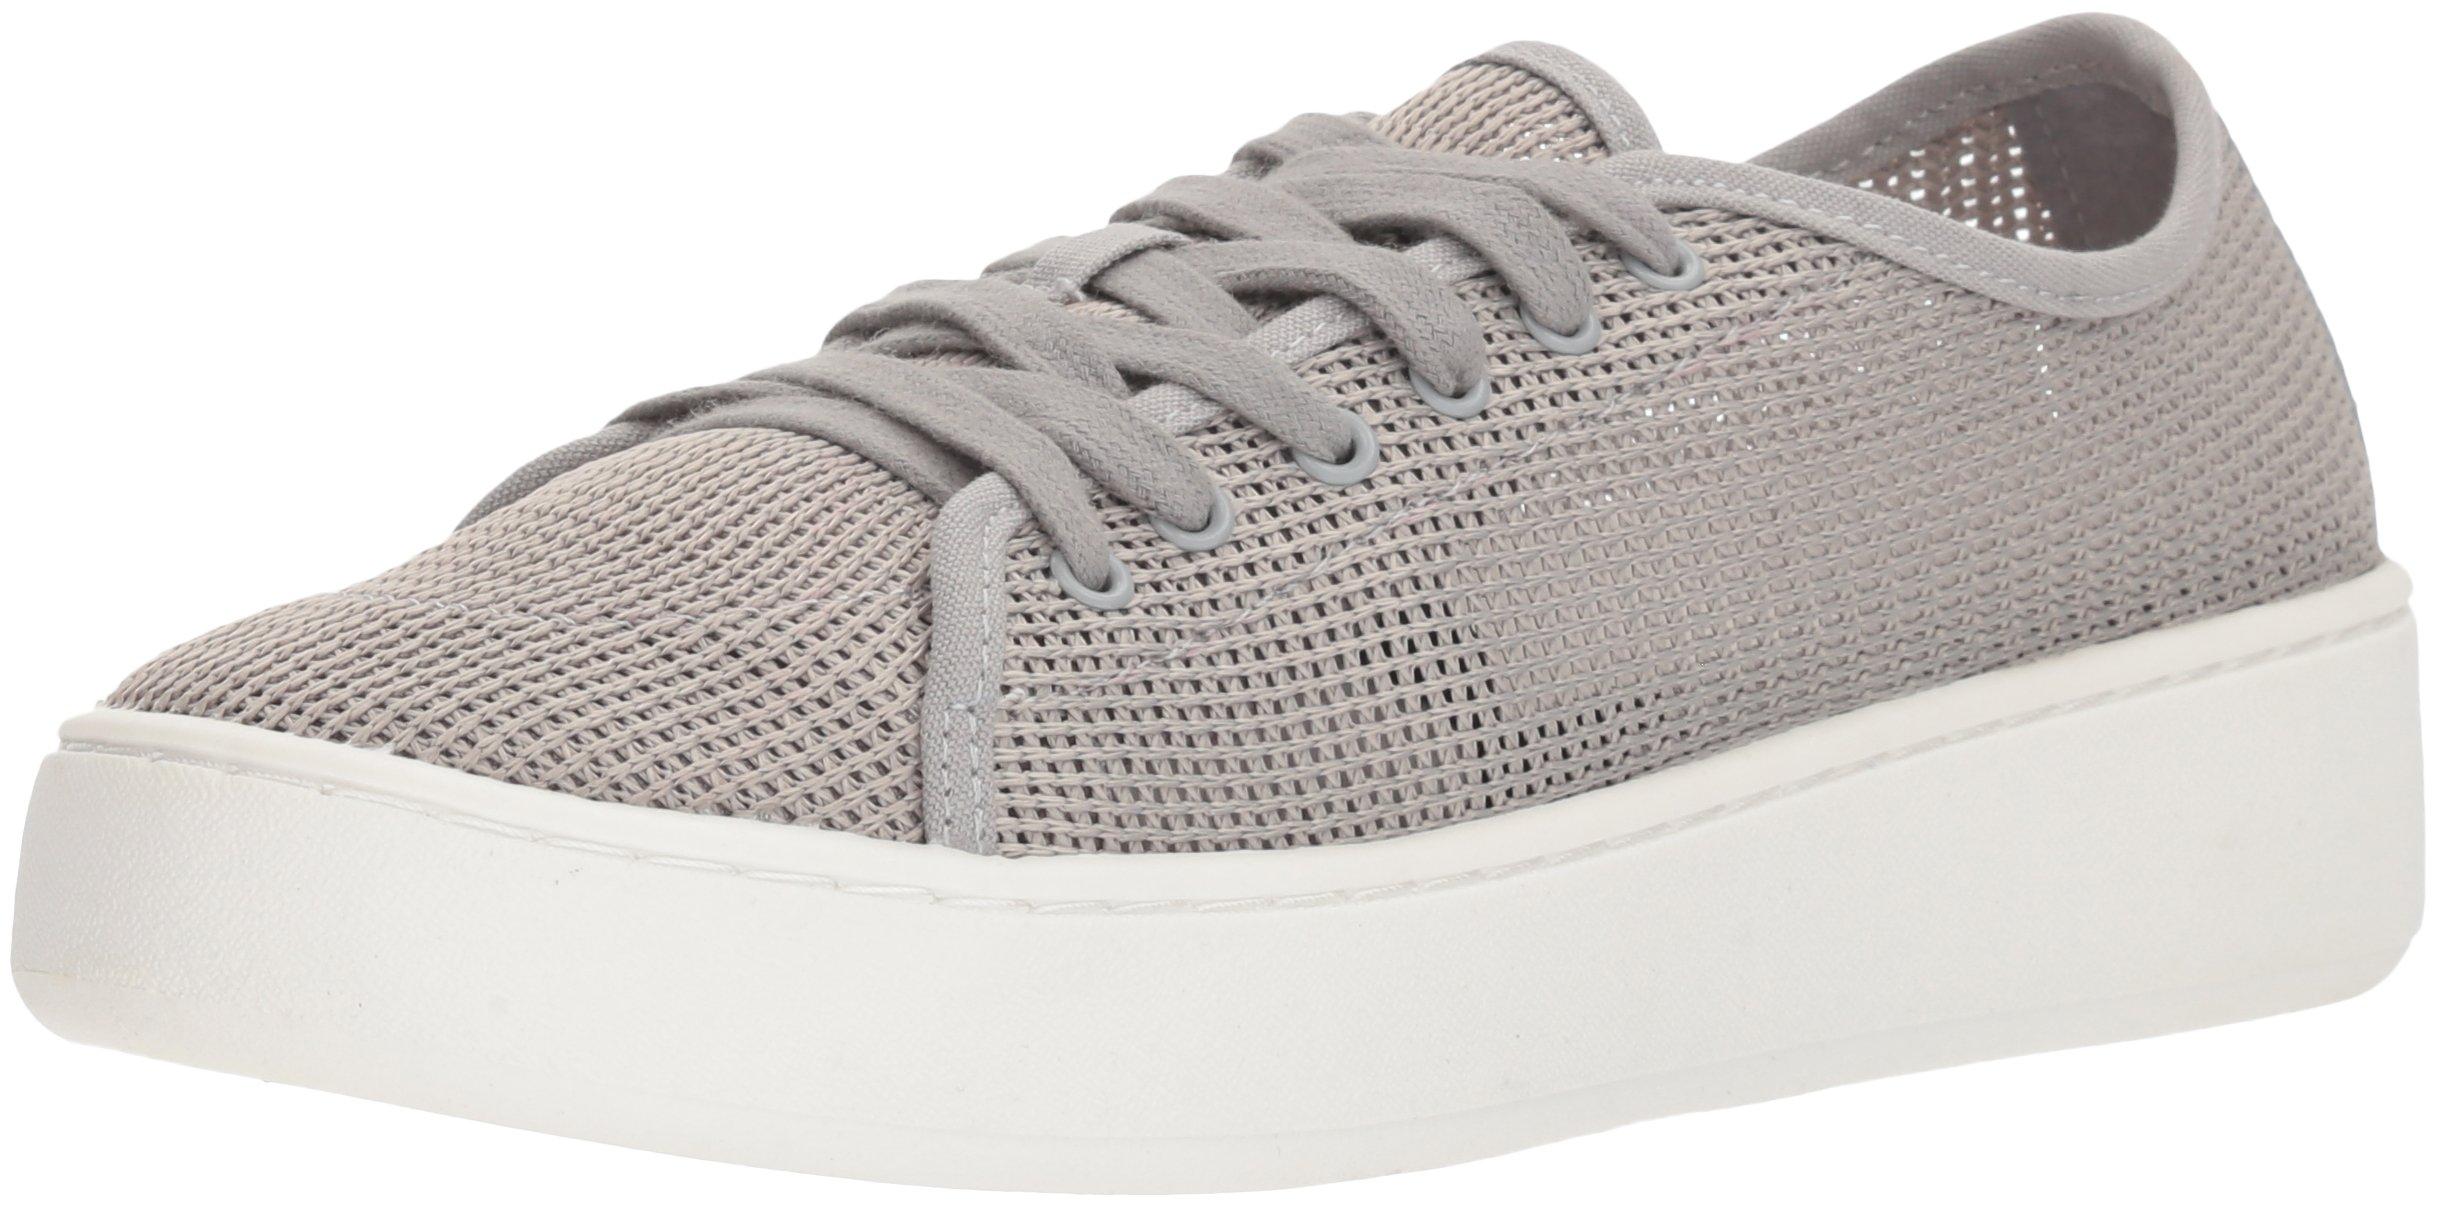 Donald J Pliner Women's Cecile Sneaker, Silver, 7.5 Medium US